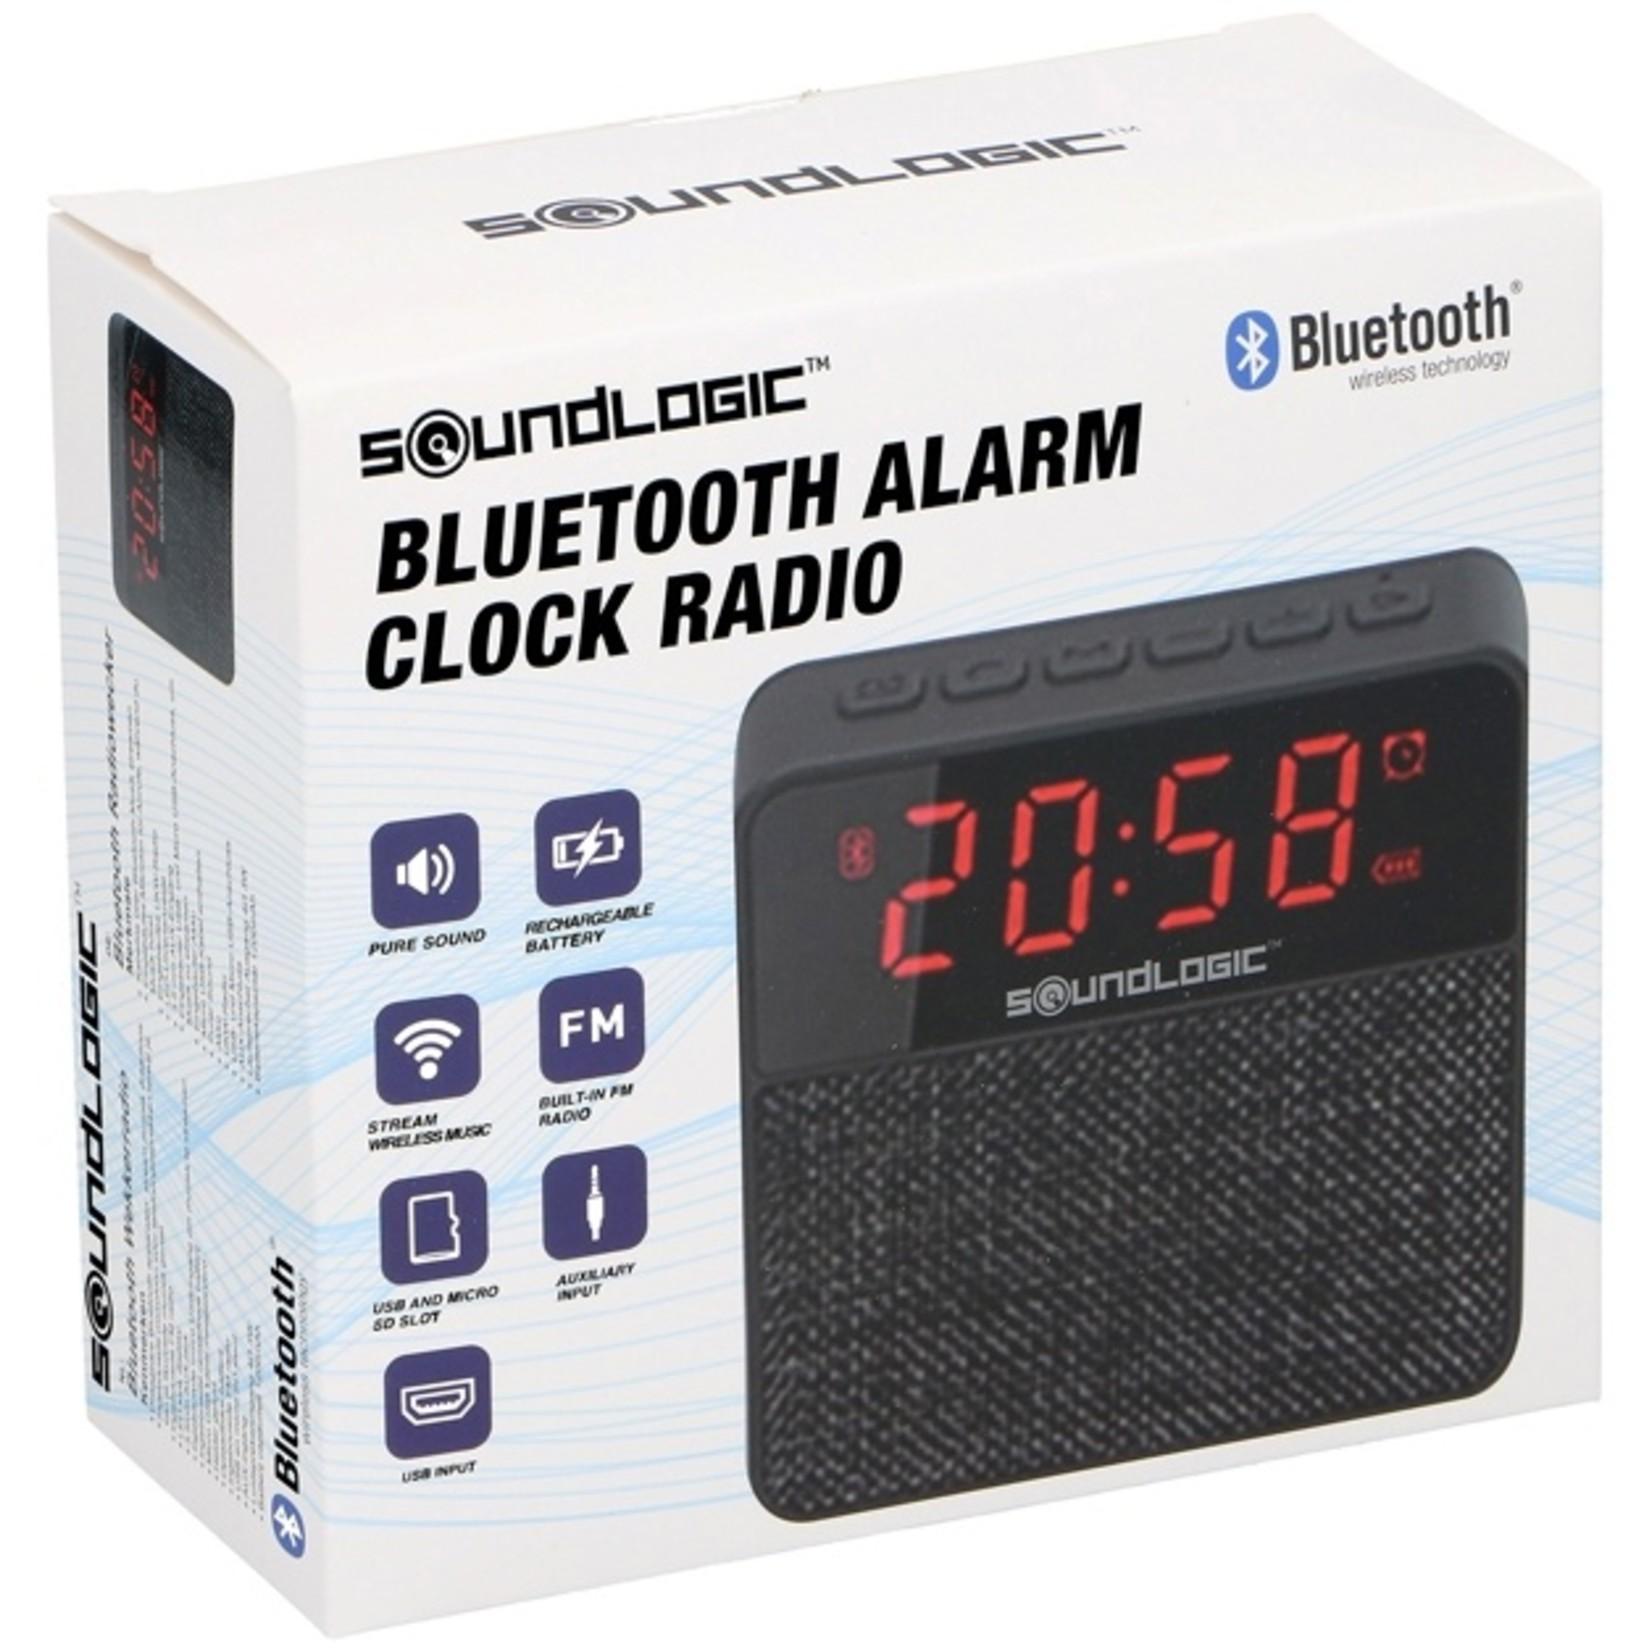 Soundlogic Bluetooth Wekkerradio